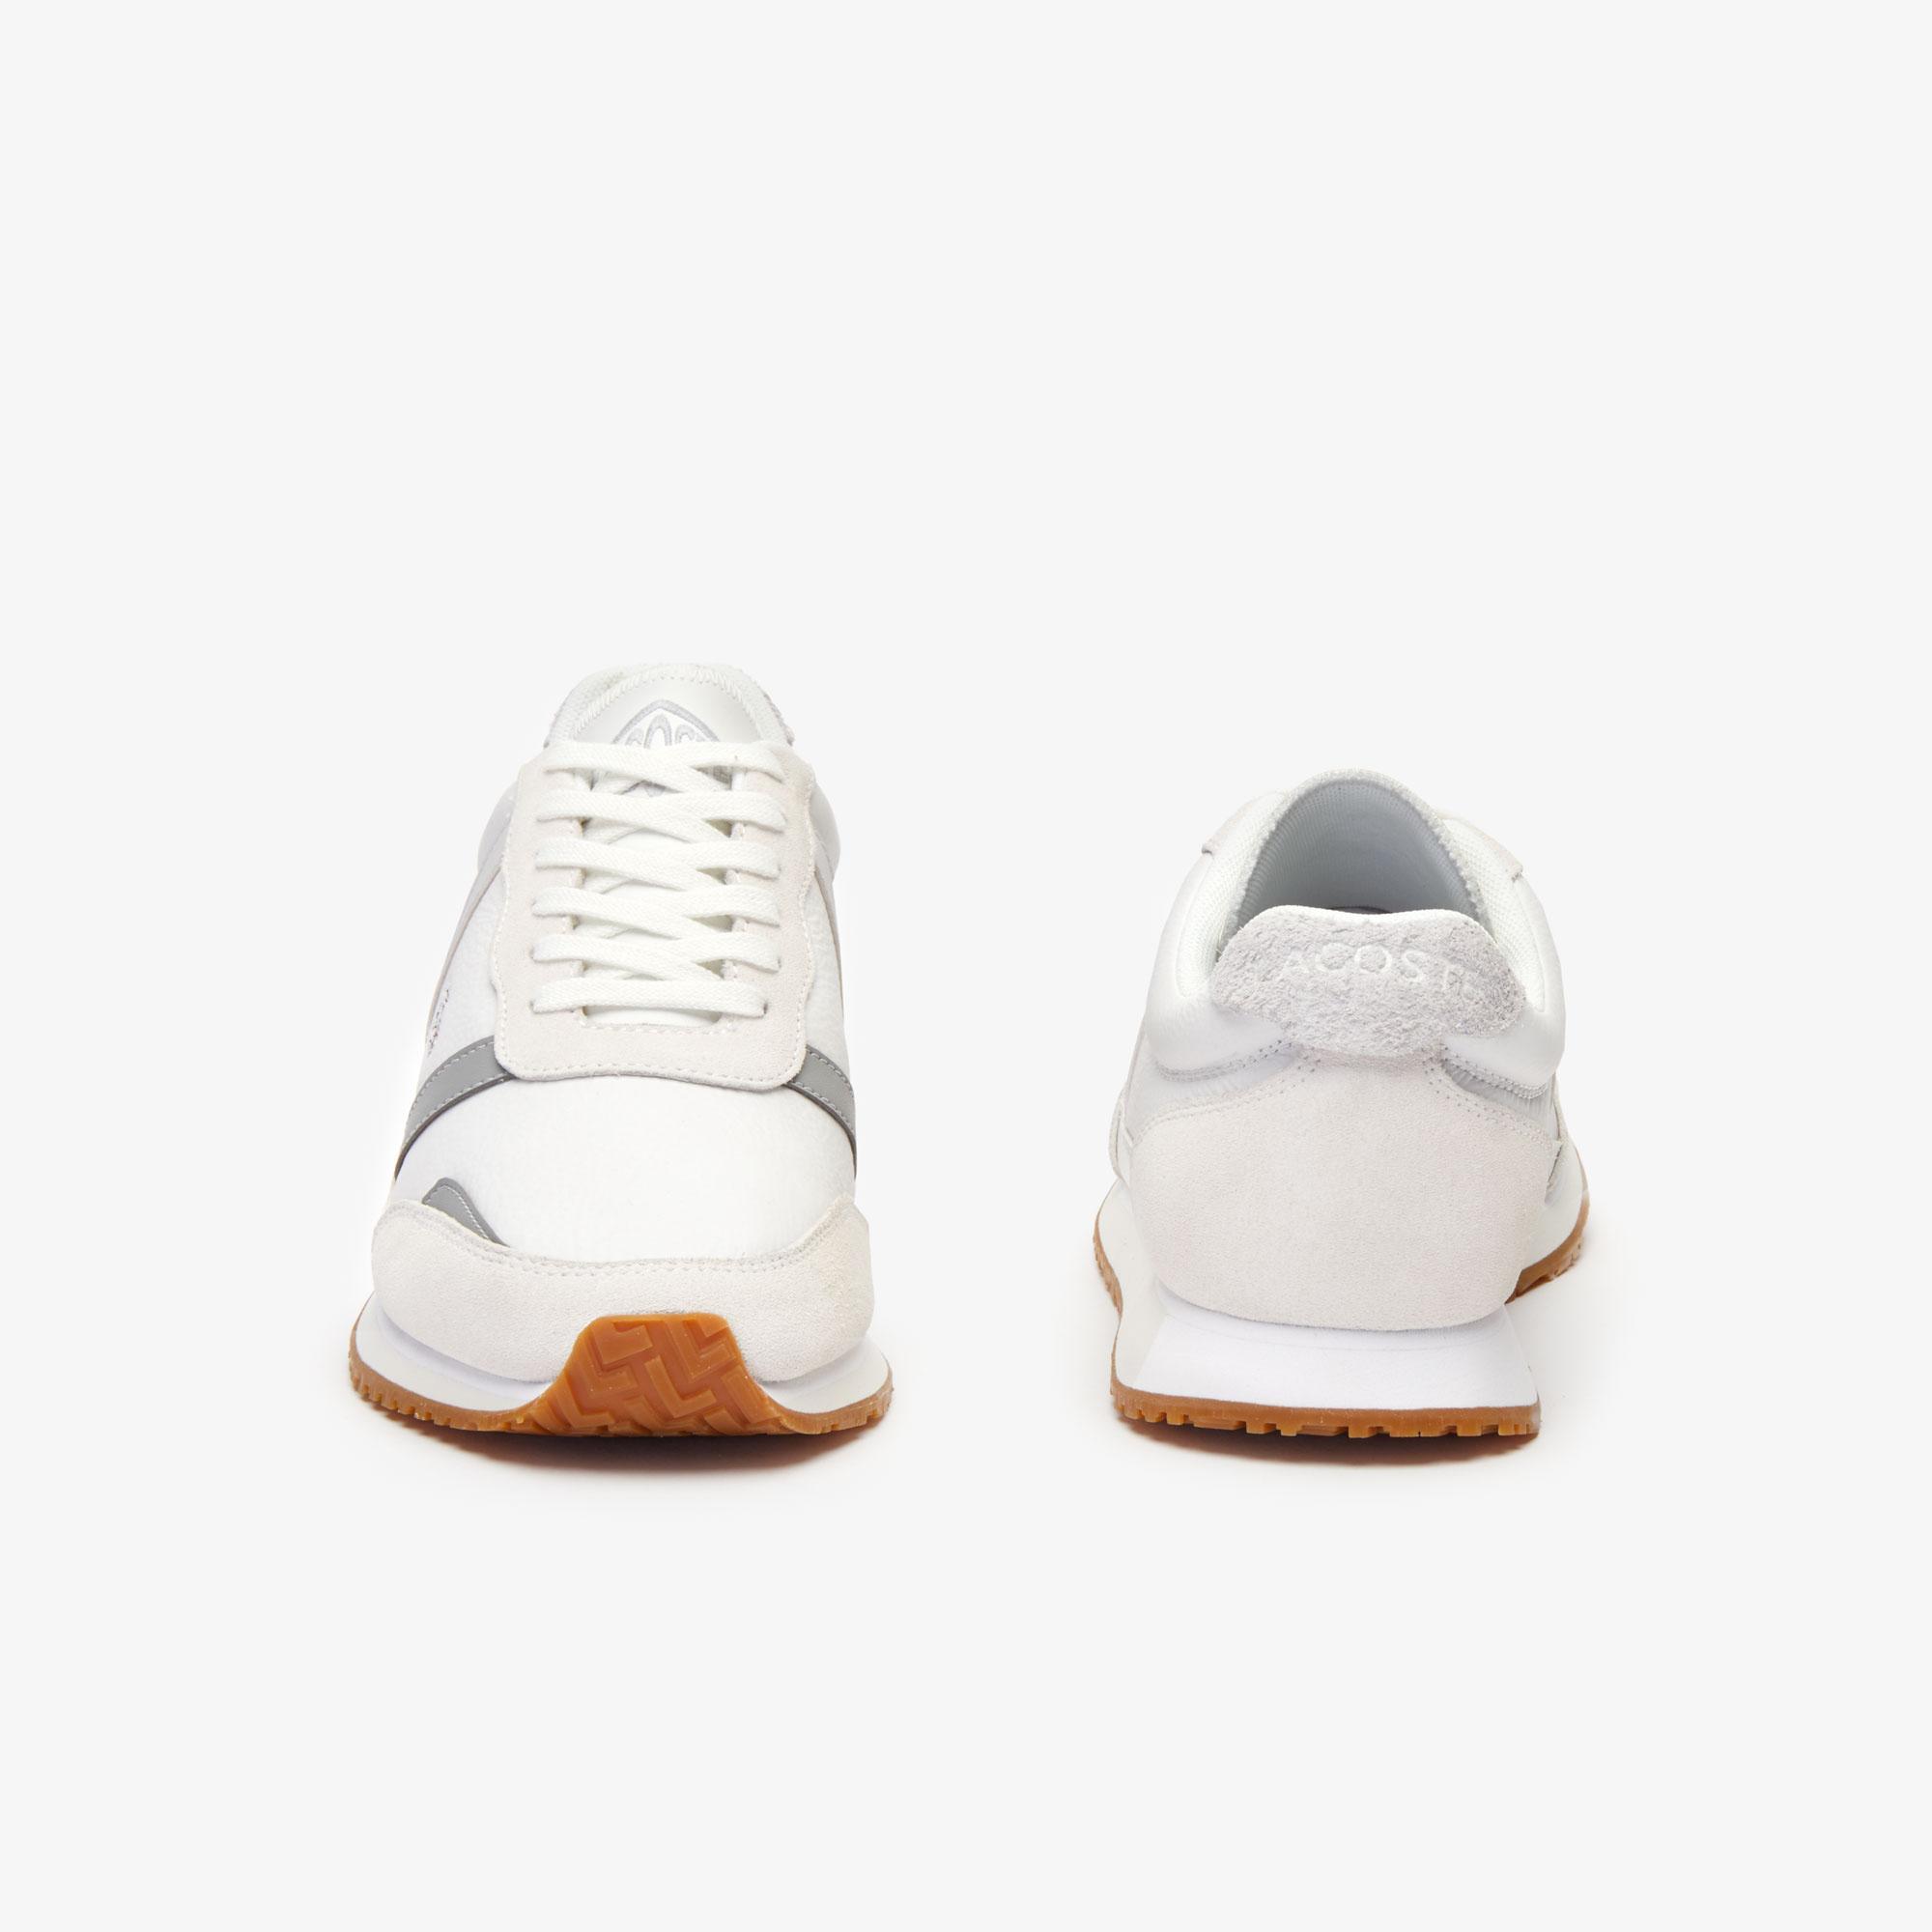 Lacoste Partner 319 1 Sfa Kadın Bej - Gri Sneaker